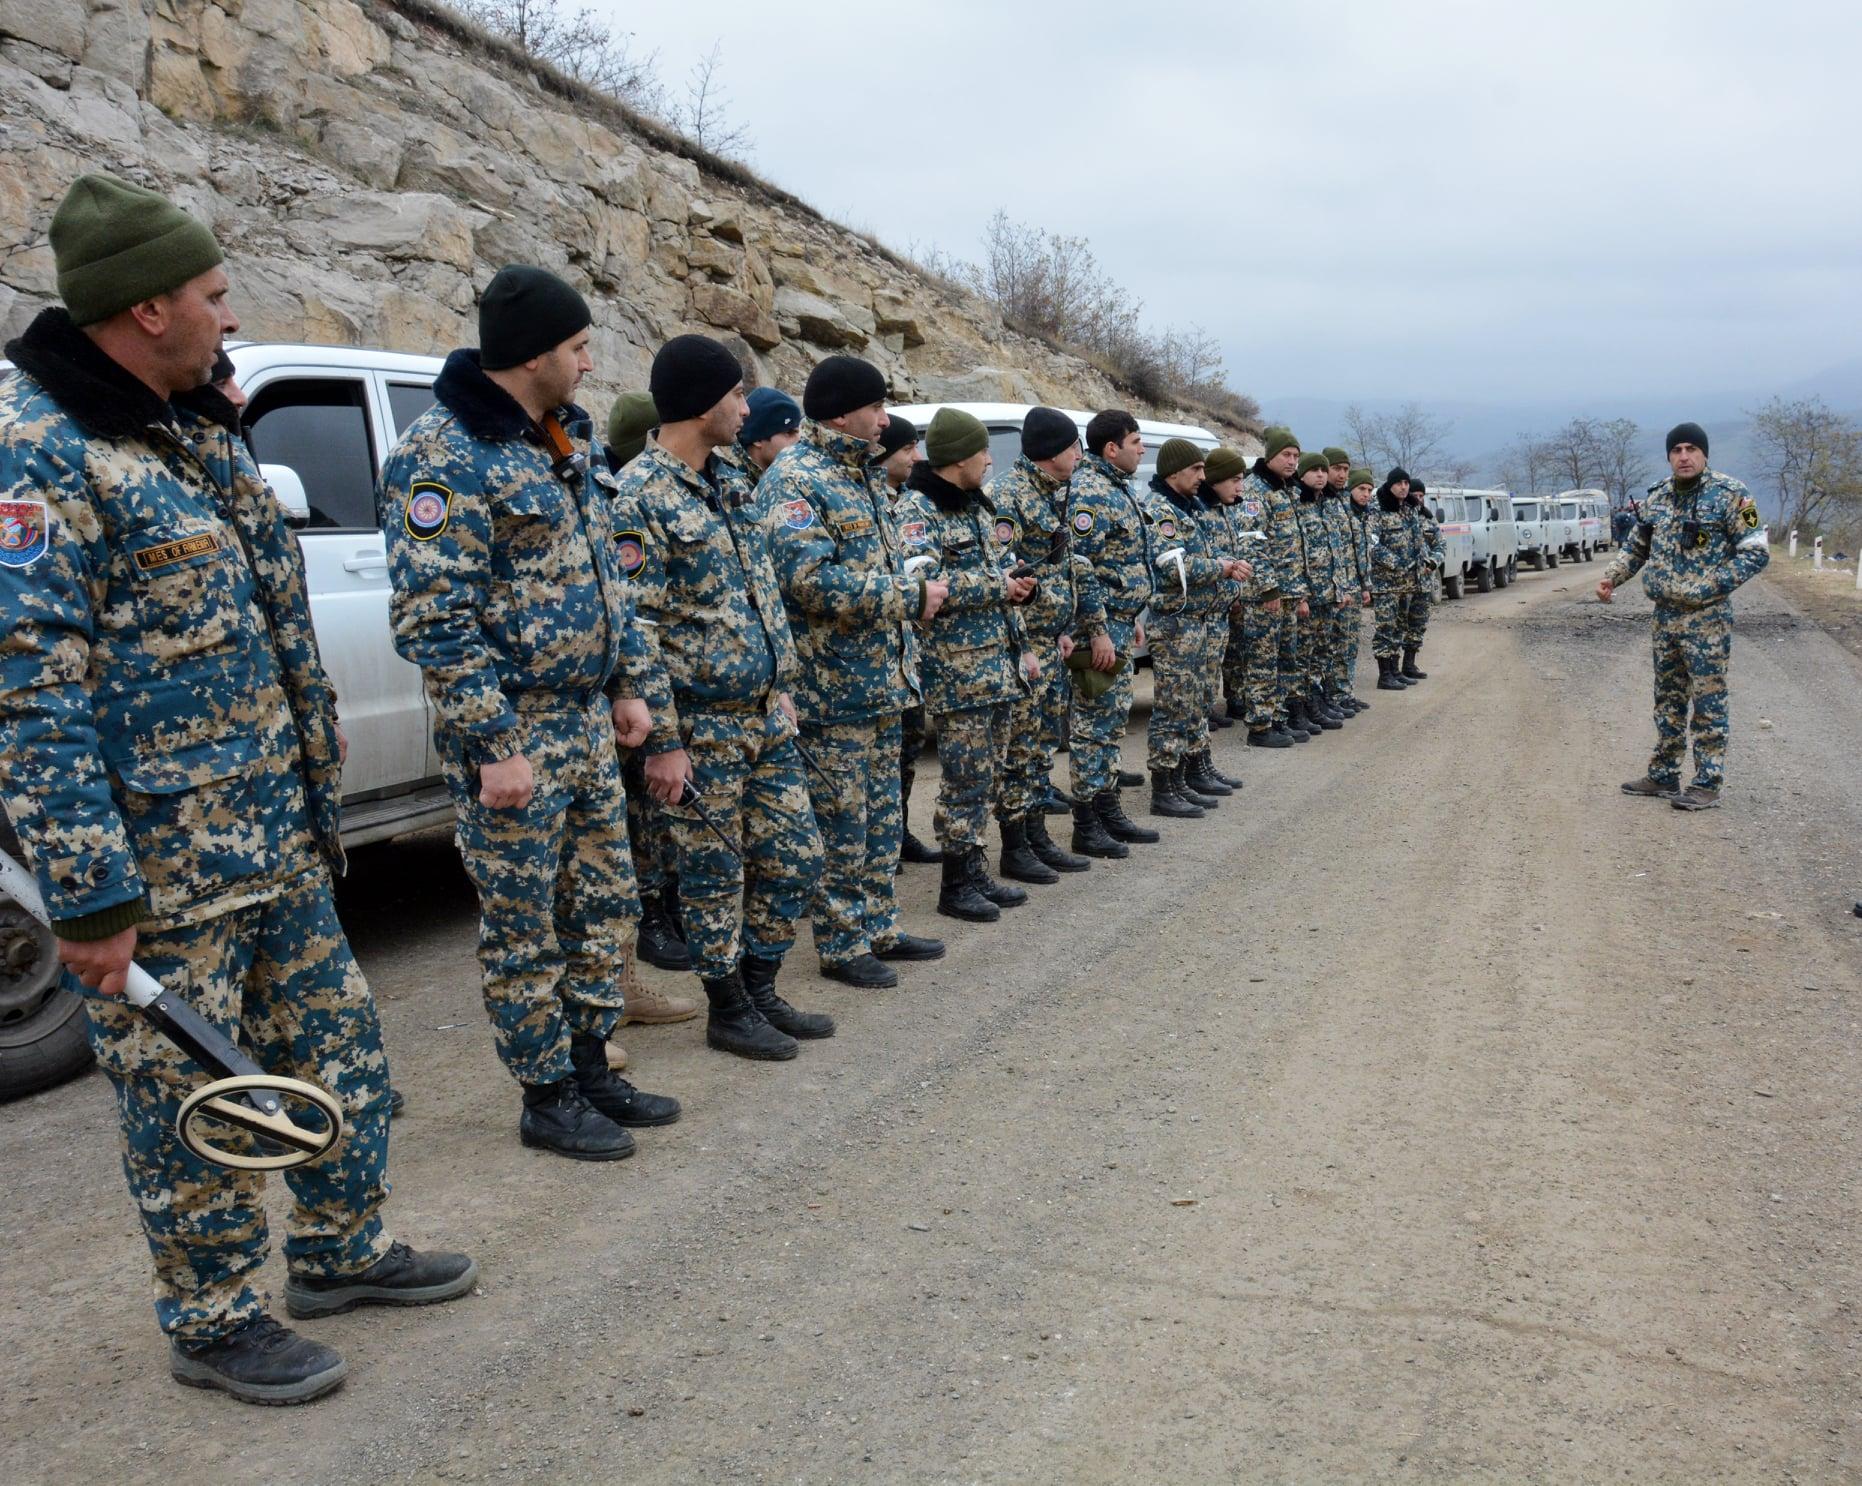 Photo of Անհետ կորած, կամ անհետ կորած զինվորների կփնտրեն Հադրութի և Վարանդայի (Ֆիզուլի) շրջաններում